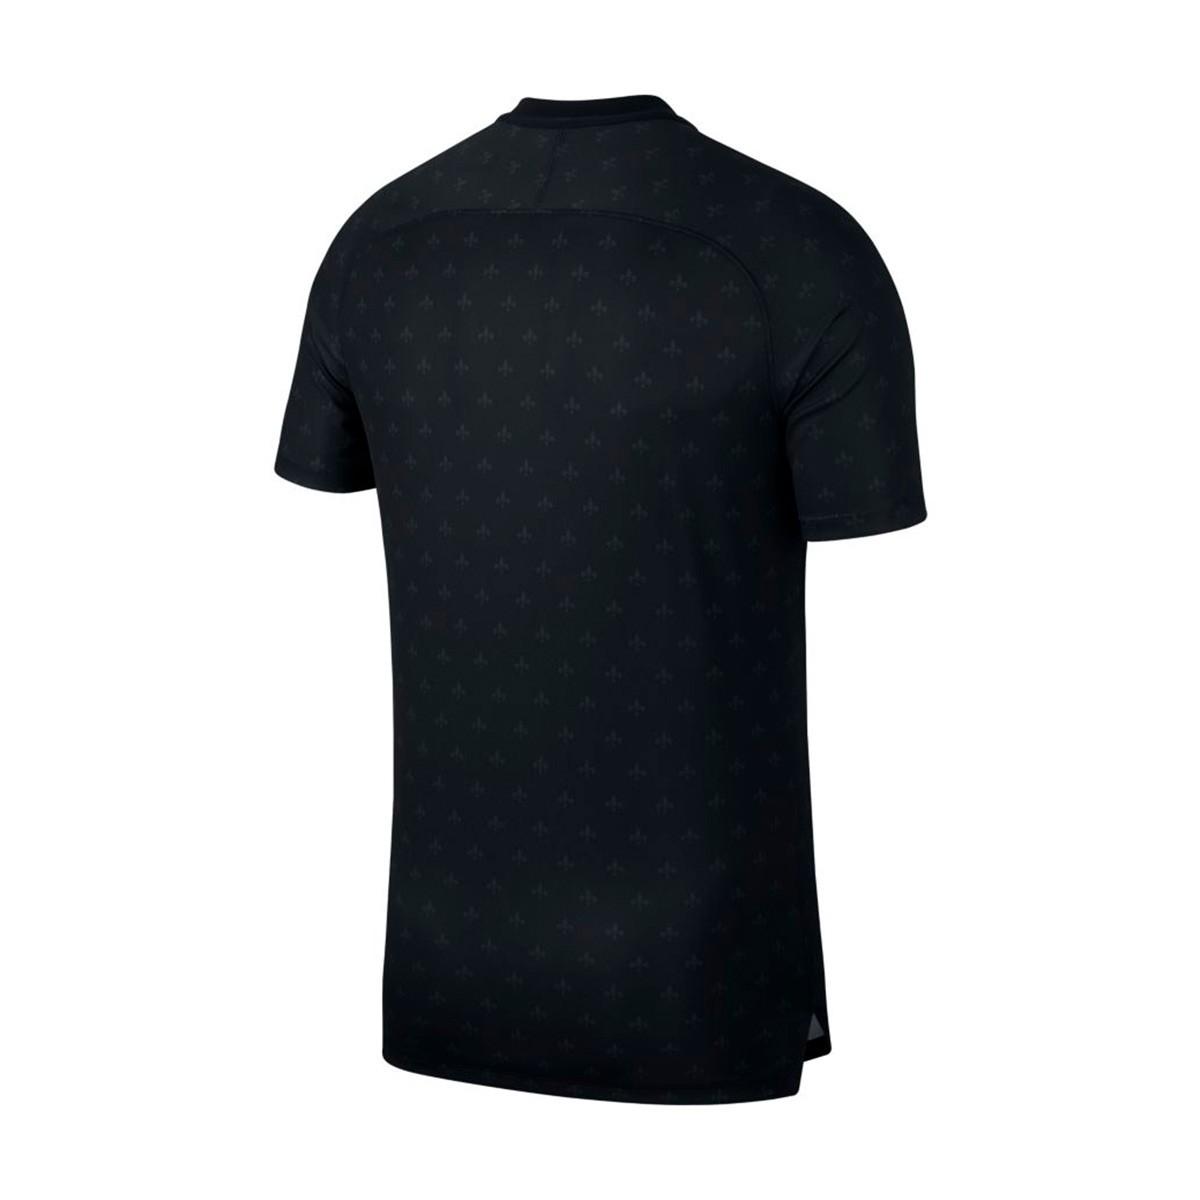 new products c10fd be7f6 Camiseta Paris Saint-Germain Squad 2018-2019 Black-Truly gold